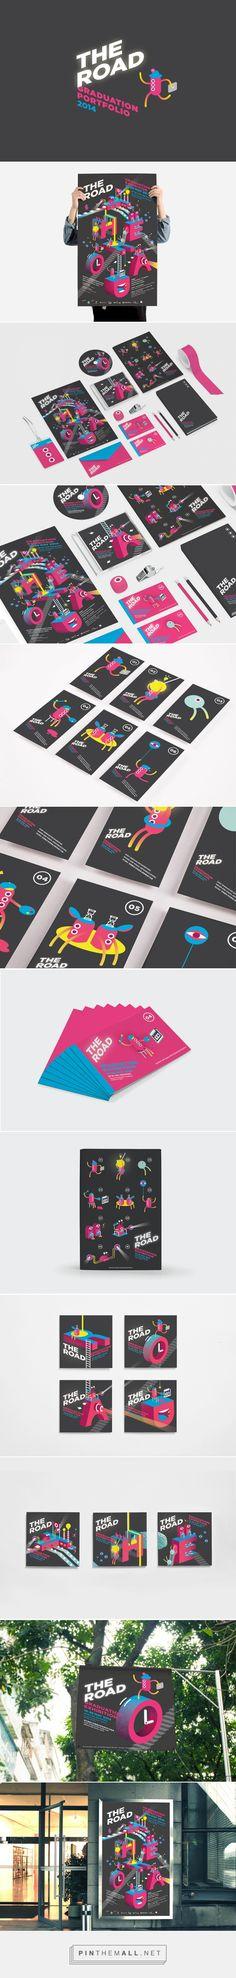 THE ROAD GRADUATION PORTFOLIO 2014 on Behance | Fivestar Branding – Design and Branding Agency & Inspiration Gallery